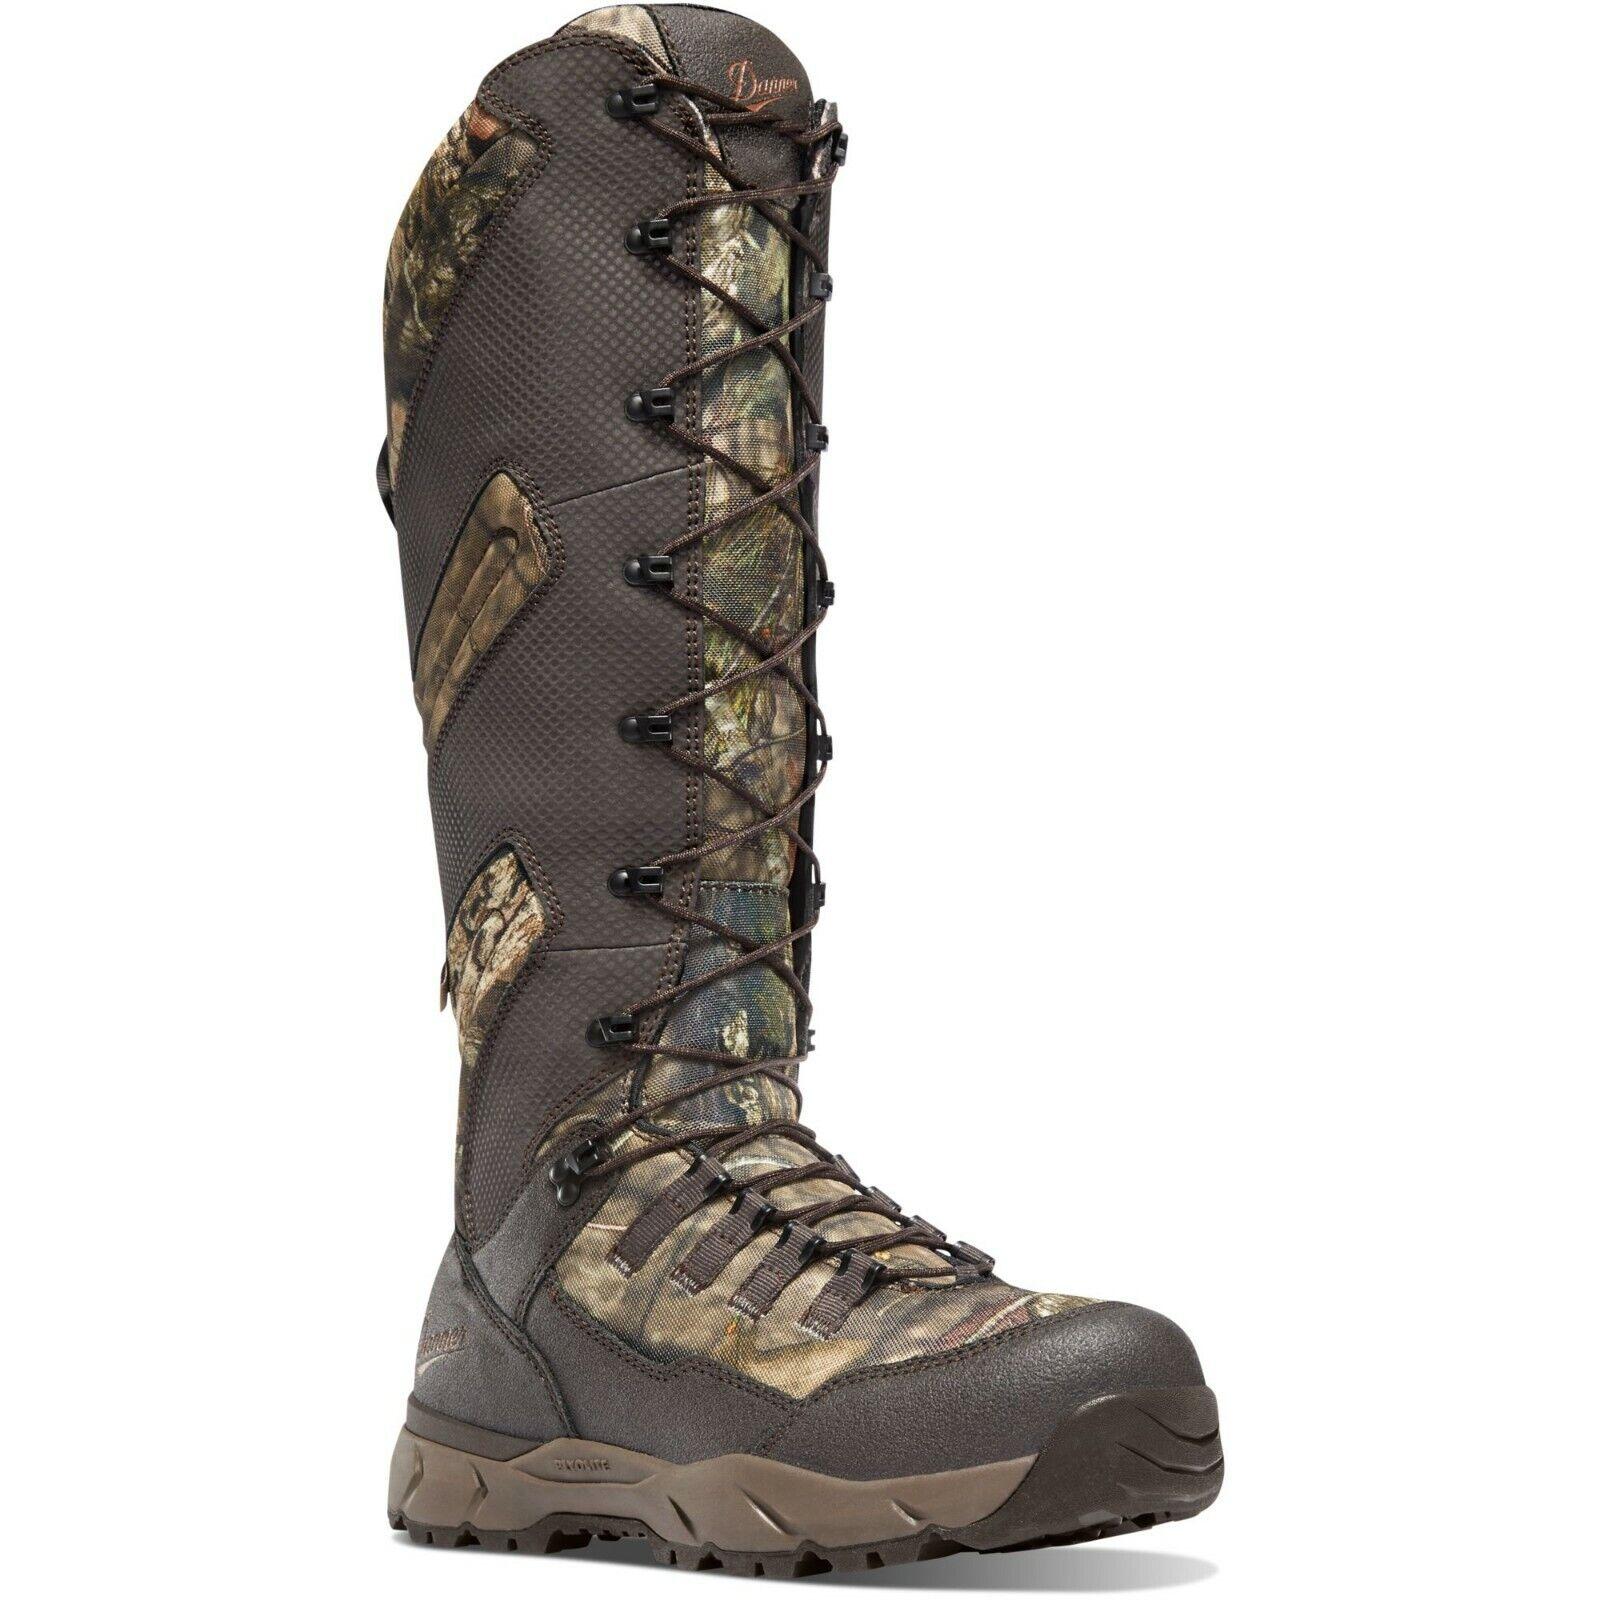 Danner Men's 41531 Vital Snake stivali 17  Mossy Oak Break-Up Country Hunt scarpe